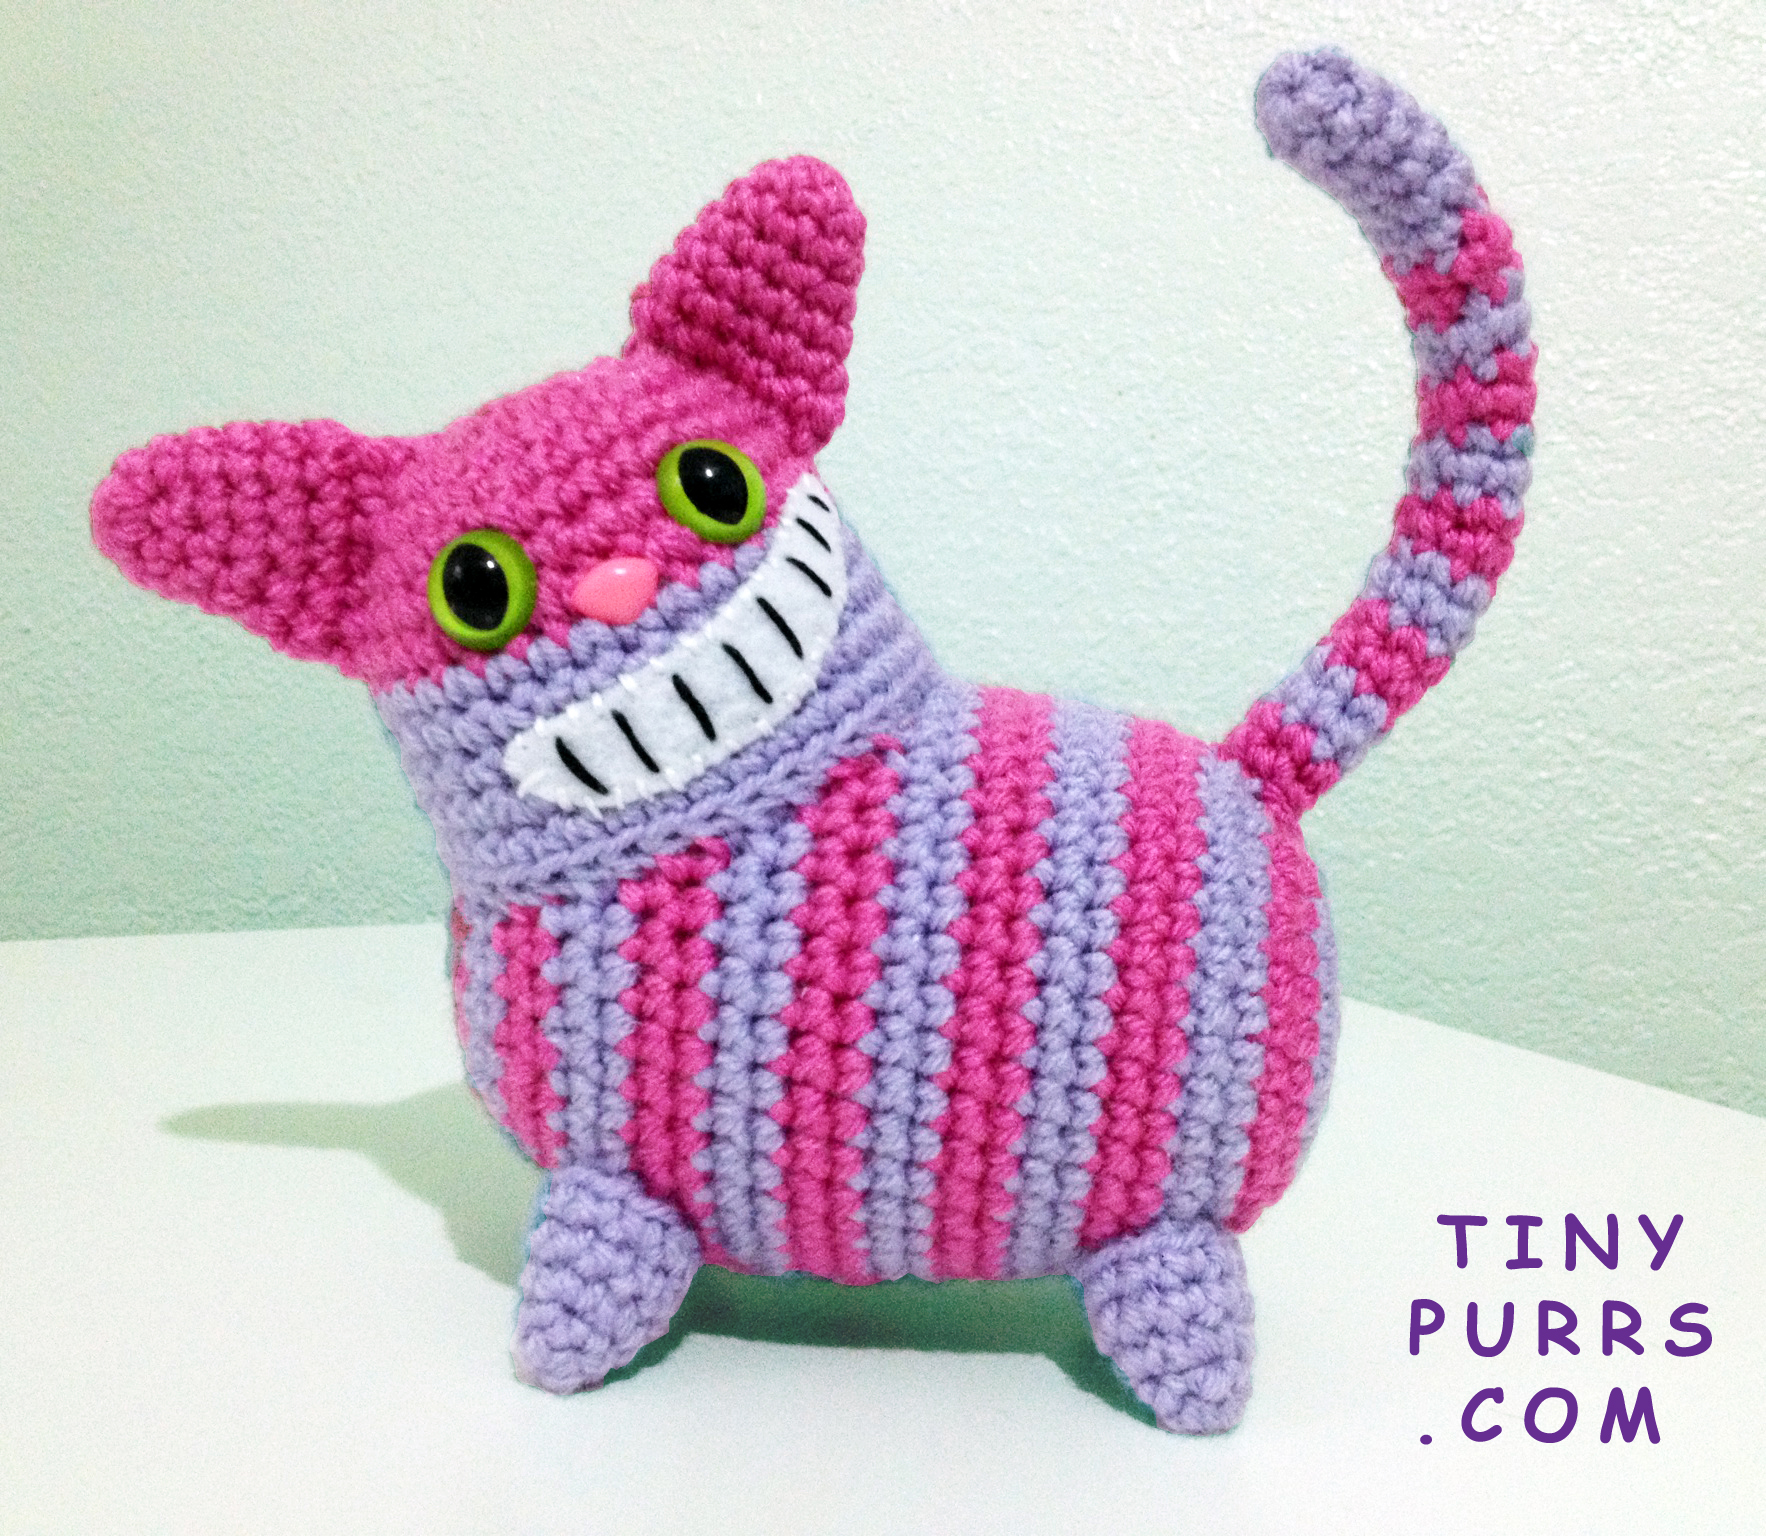 Cheshire Cat Amigurumi : amigurumi Tiny Purrs